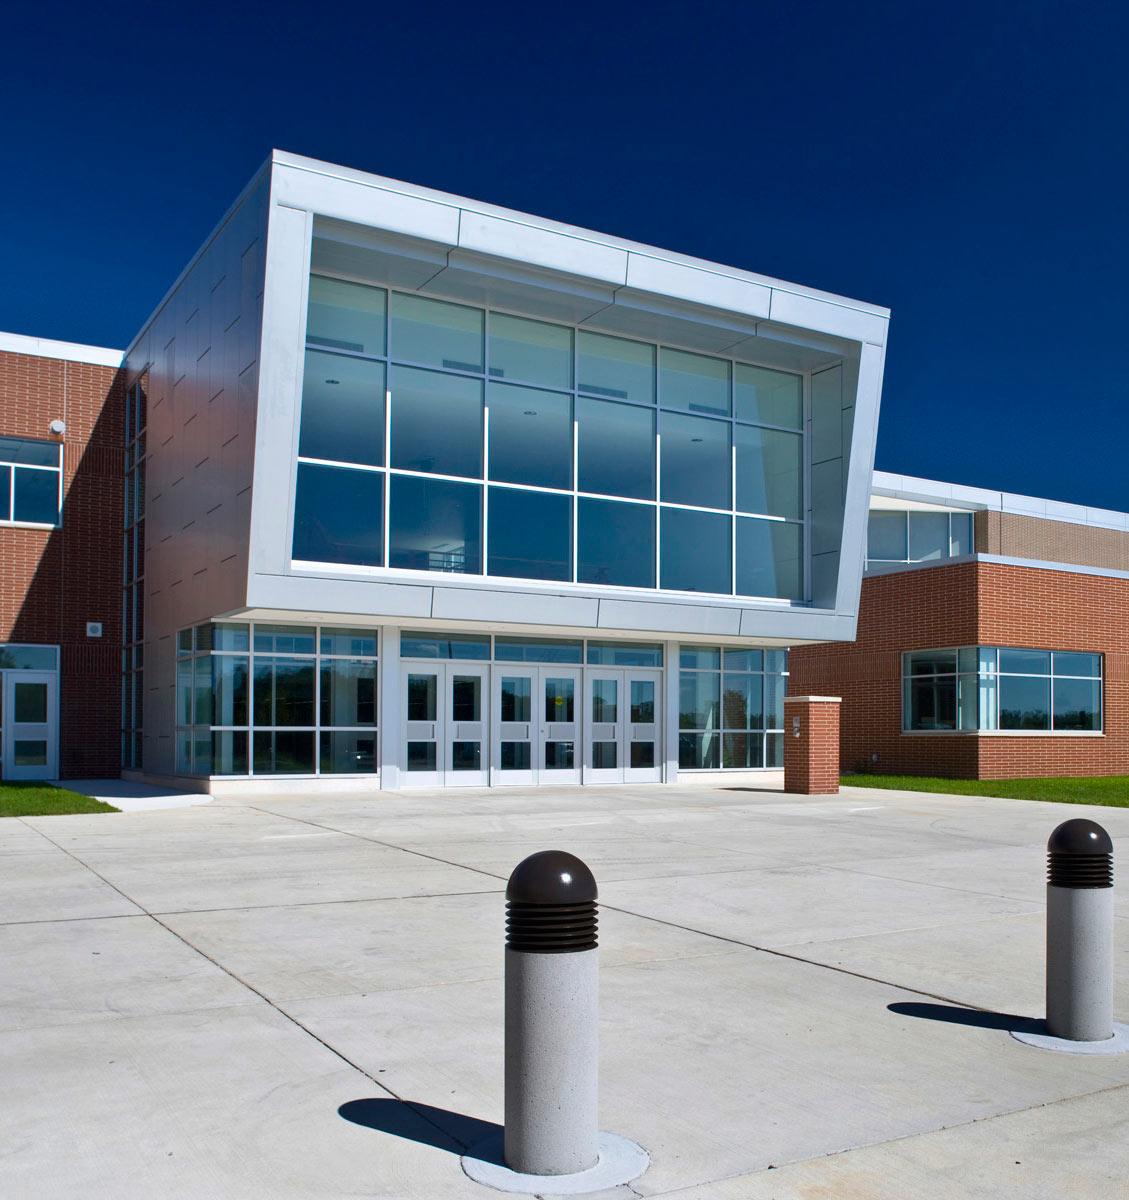 Howell Public Schools - Howell High School Renovation